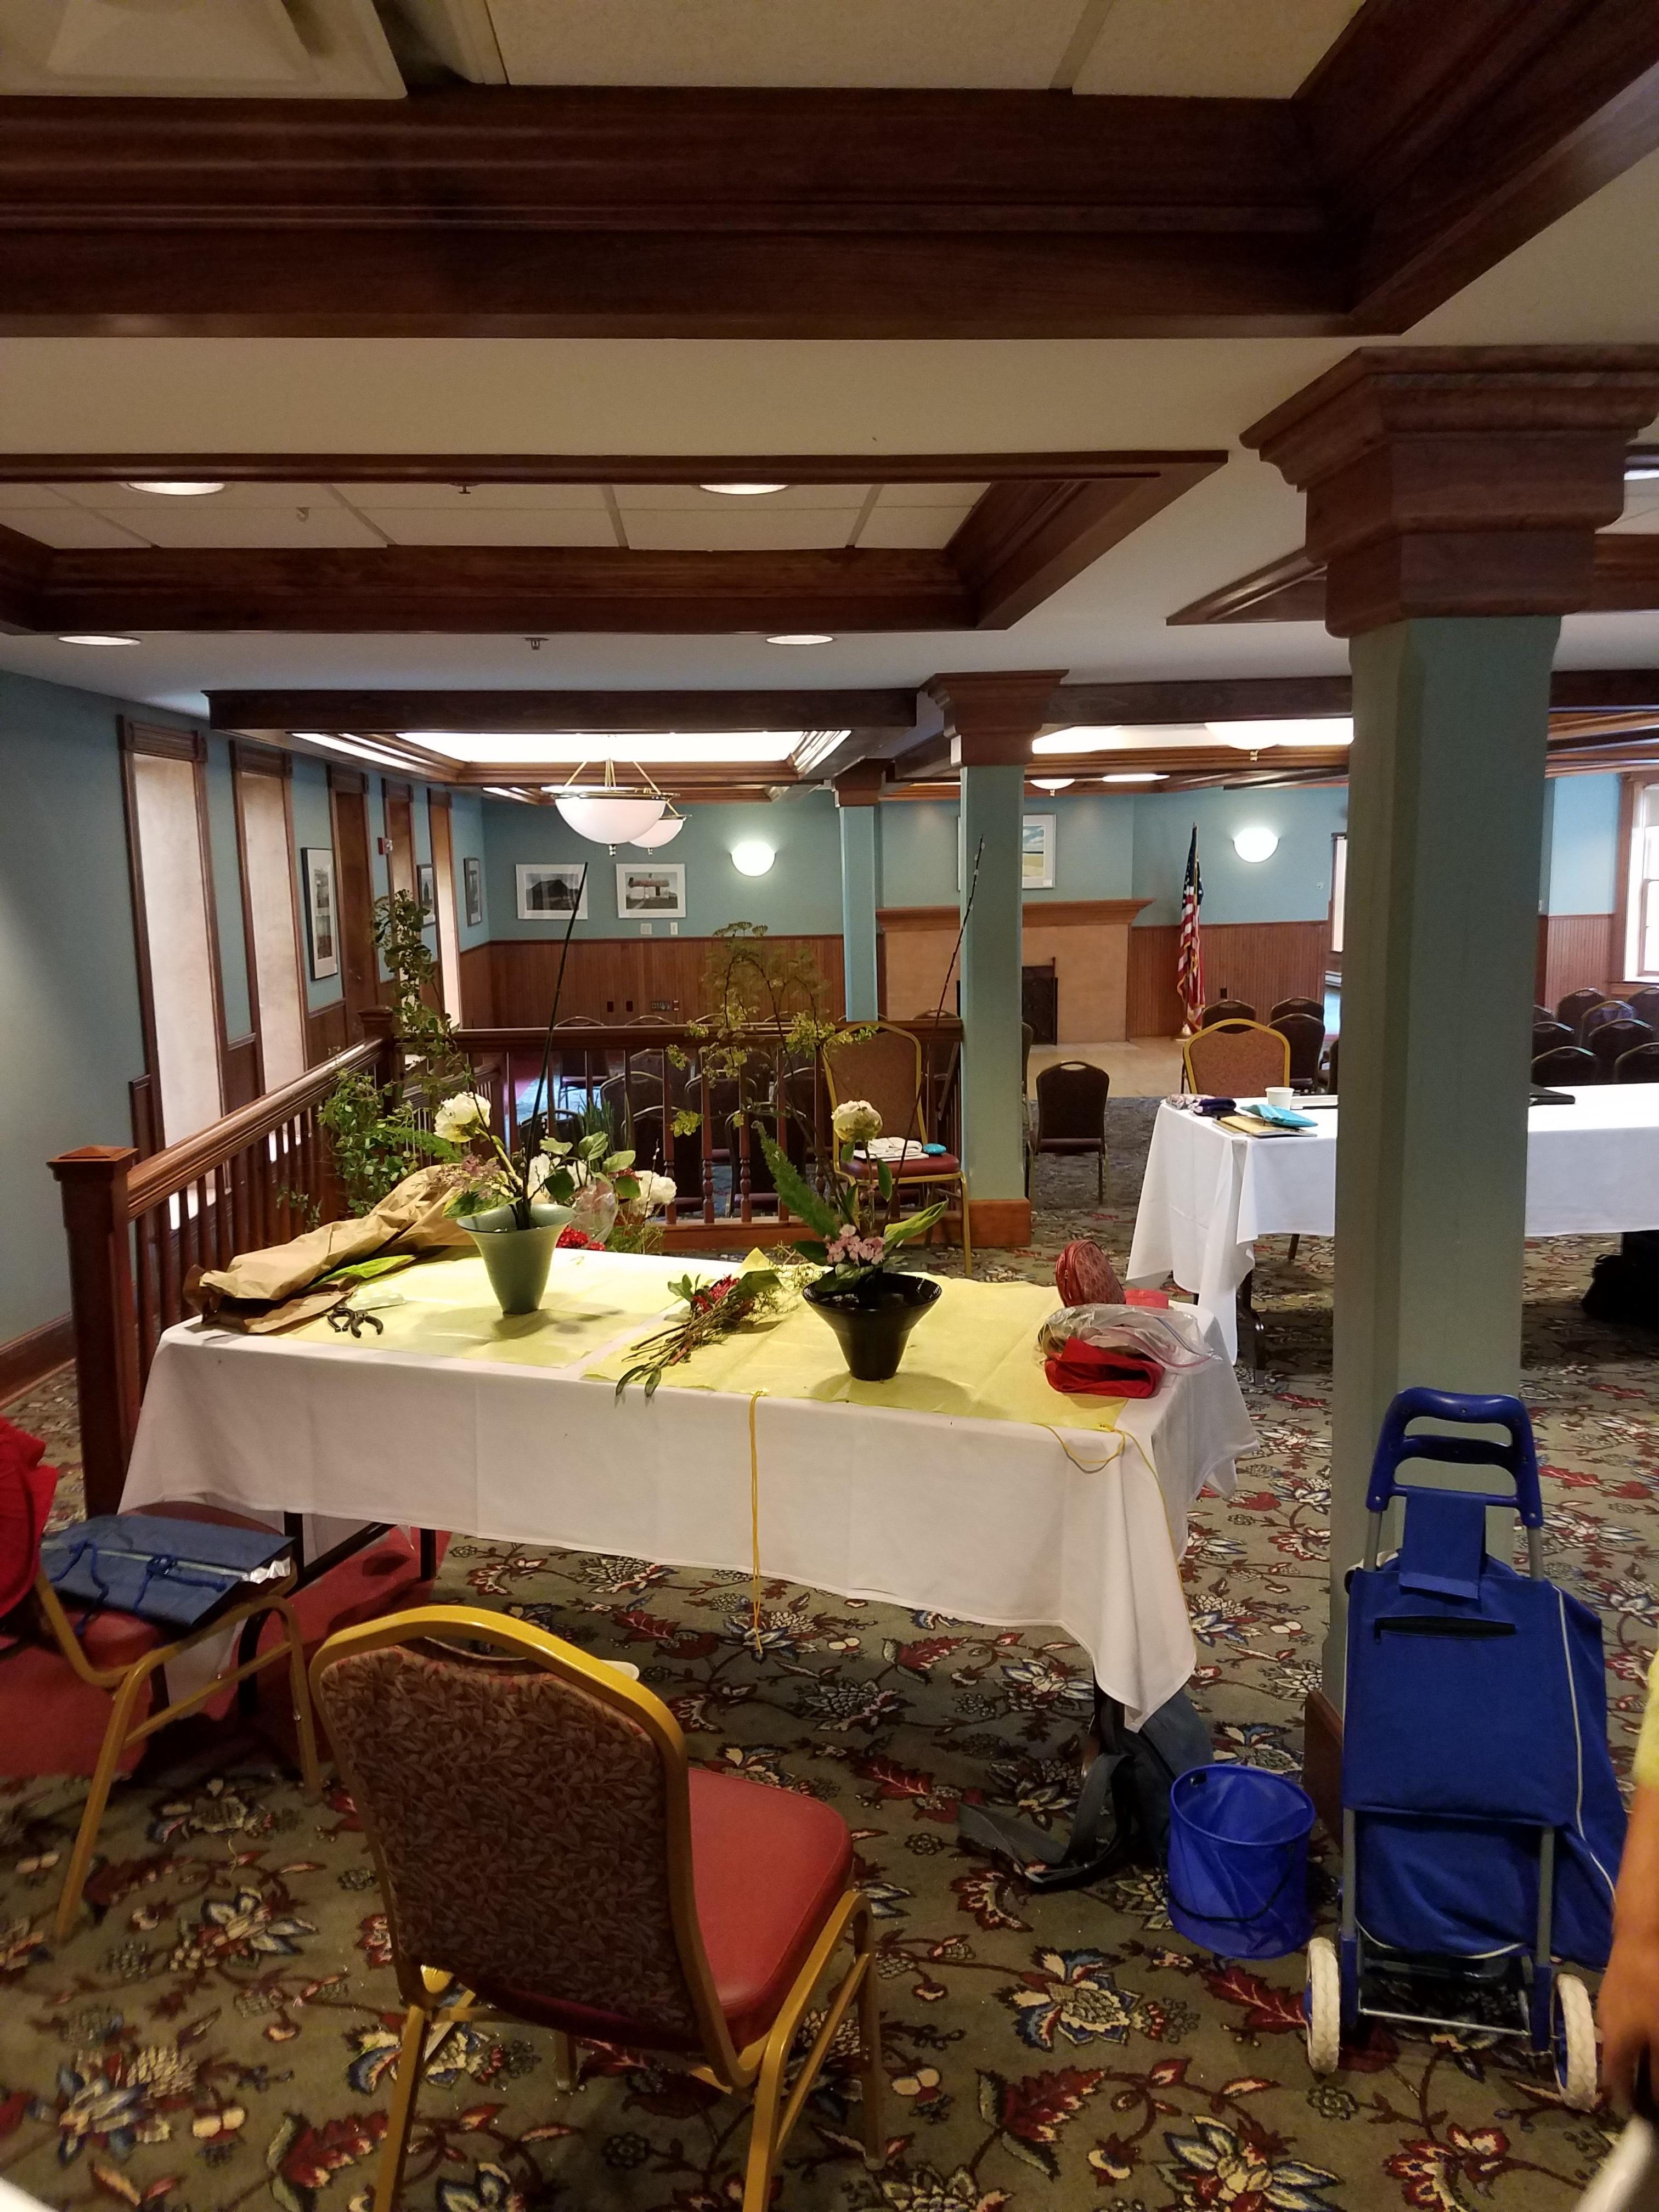 Professor mayumi chino rikka shimputai workshop 2017 - Chicago flower and garden show 2017 ...